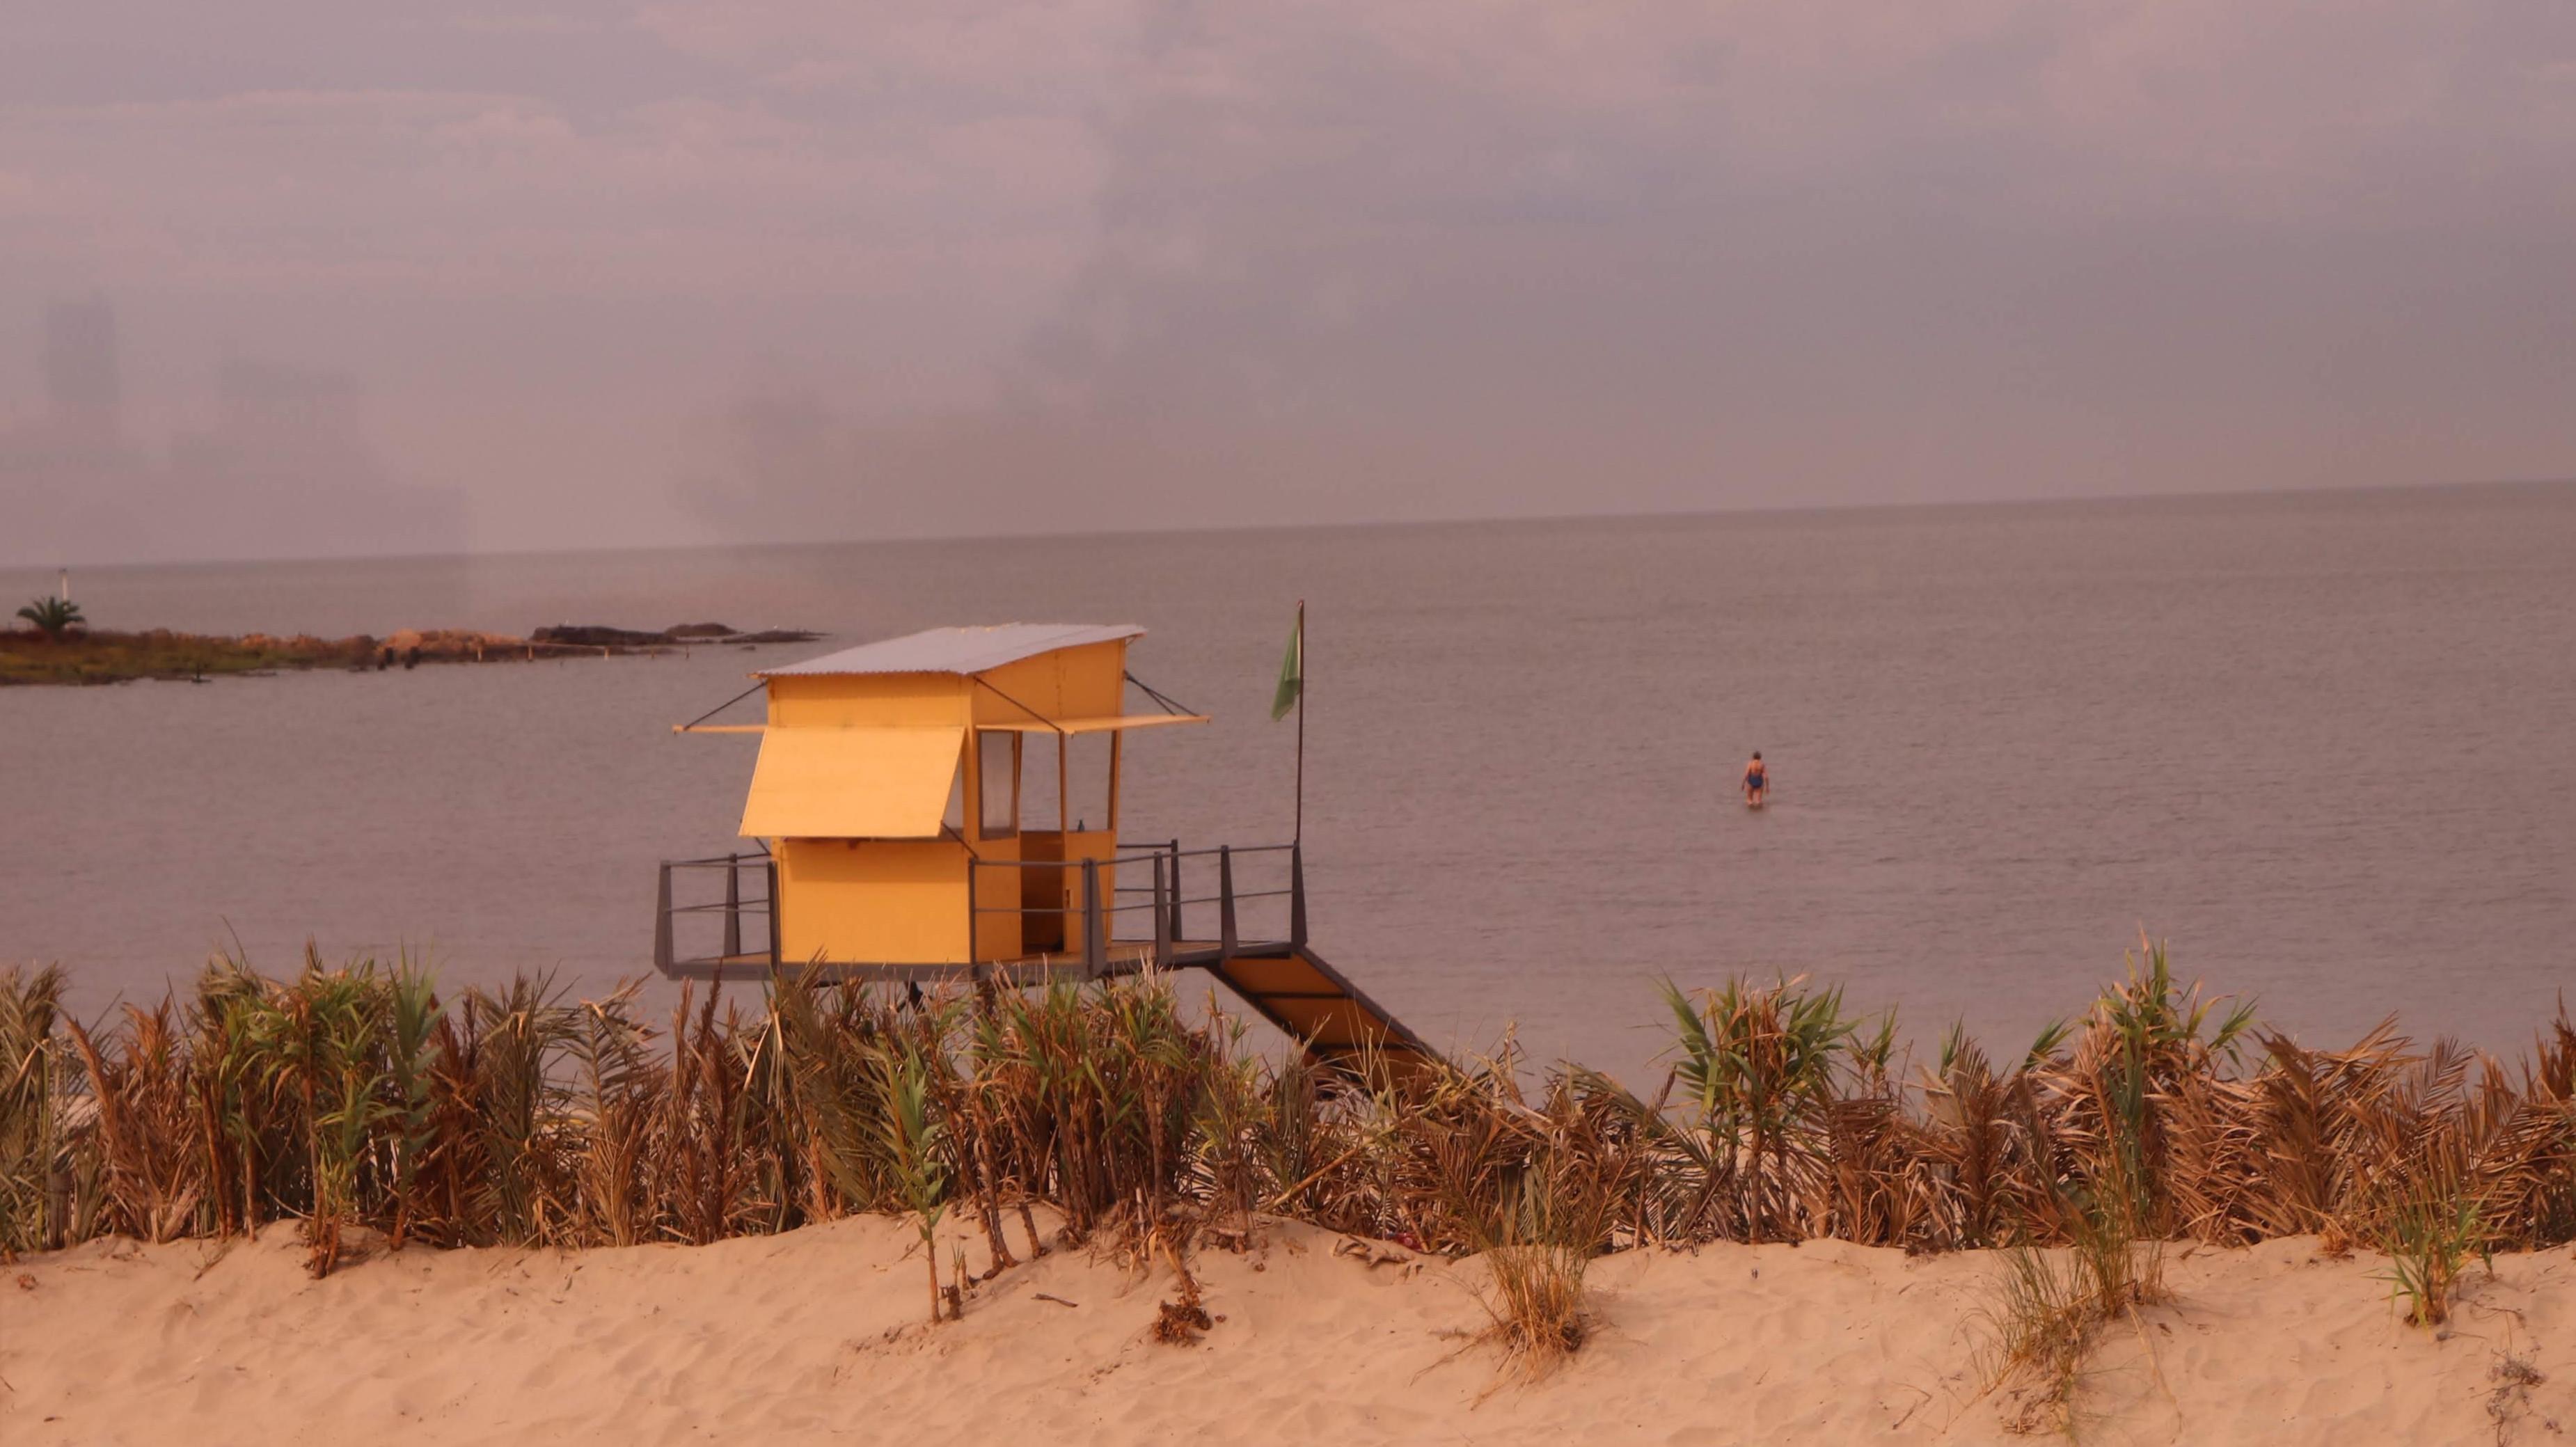 Yellow lifeguard hut. (Montevideo, Uruguay)